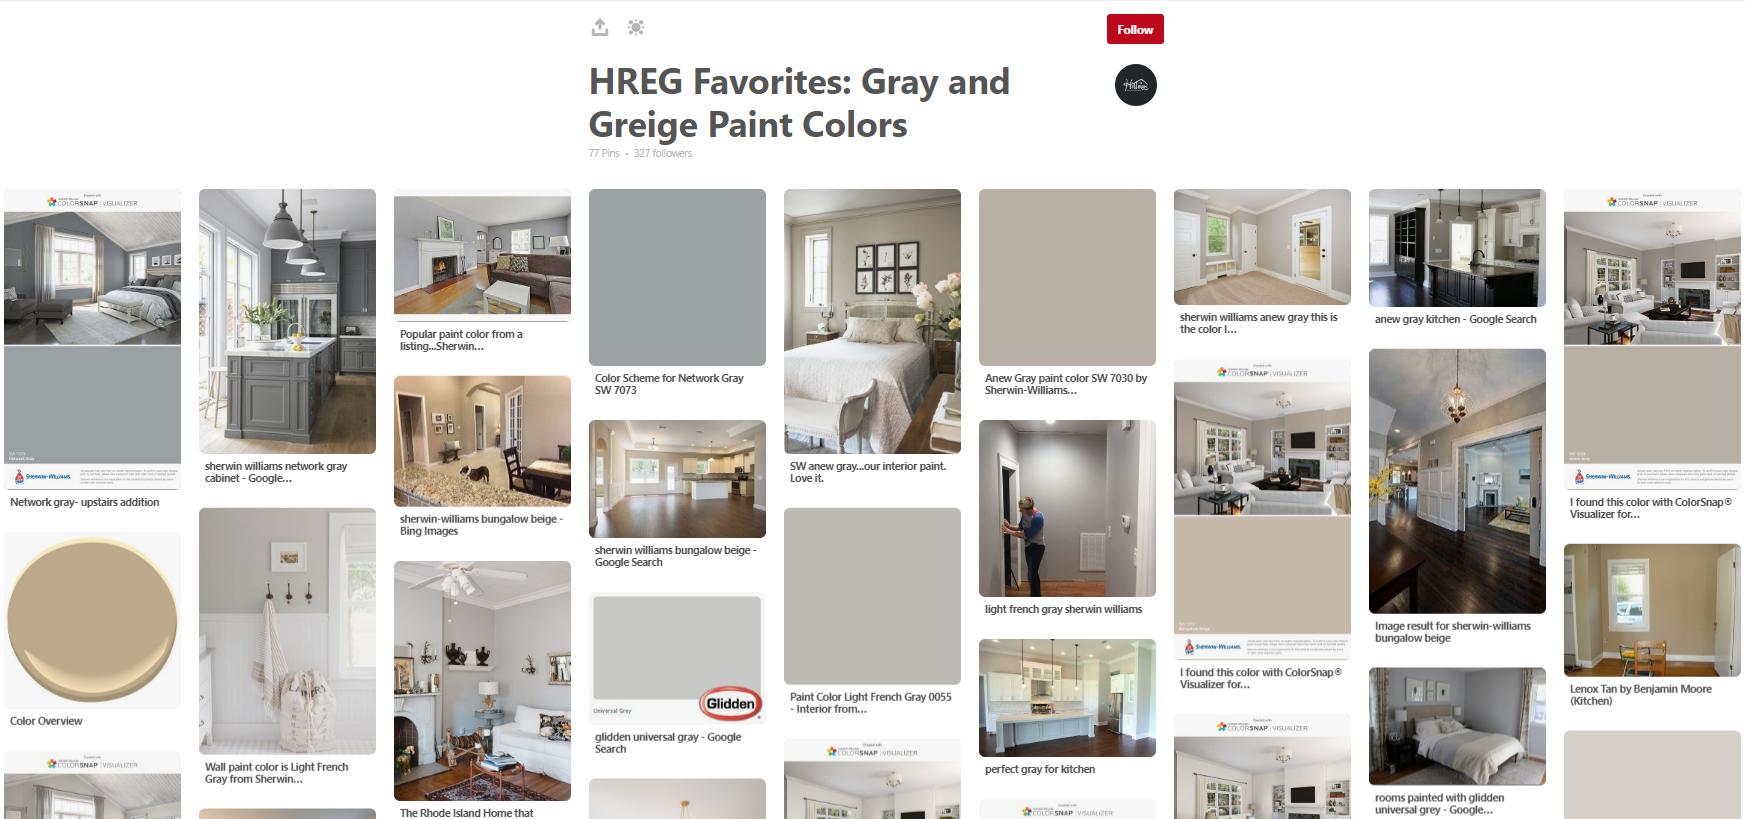 Hreg Favorites Gray Greige Paint Colors Hillman Real Estate Group